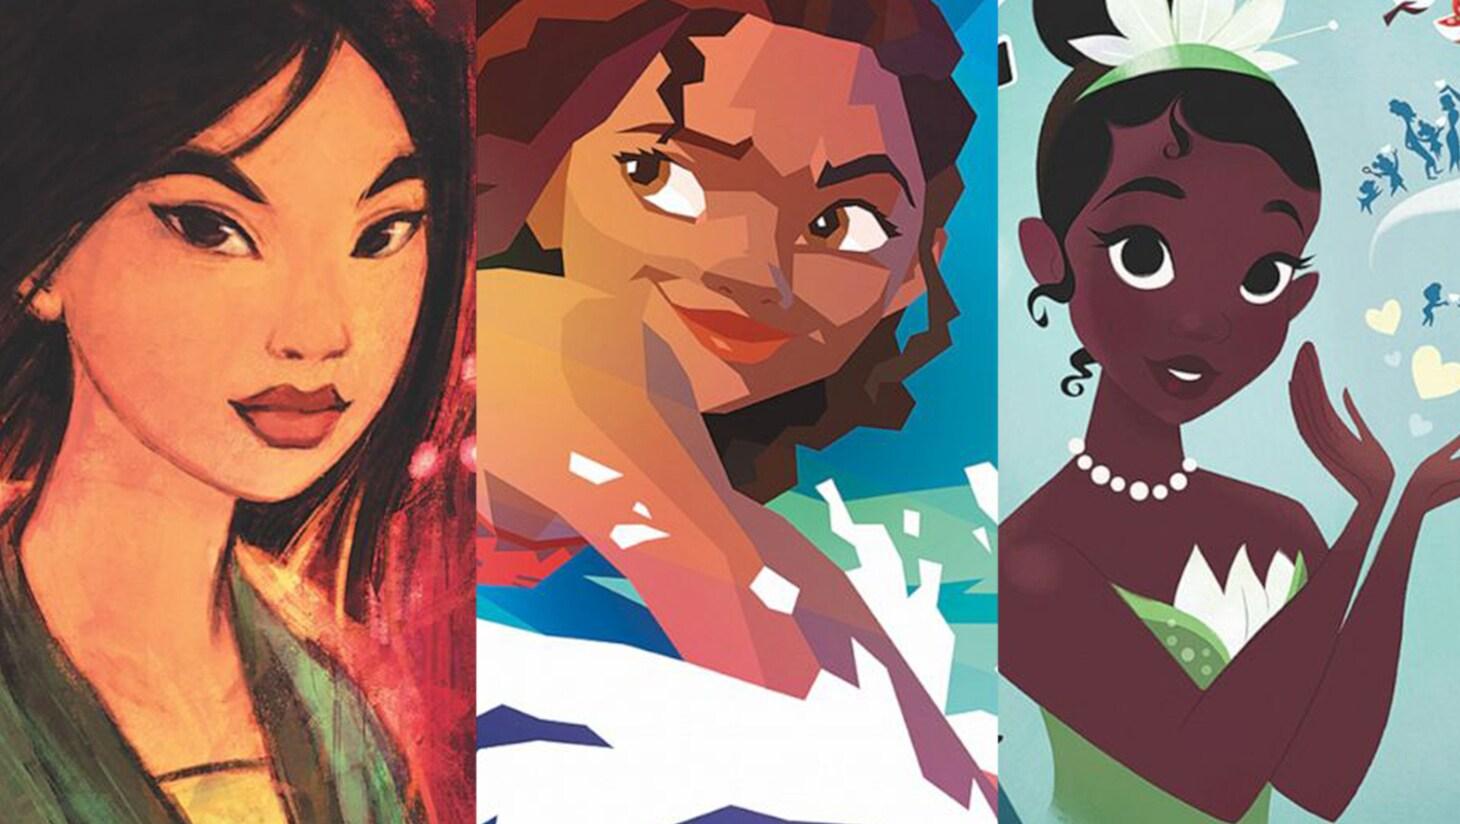 Collage of art of Mulan, Moana, and Tiana